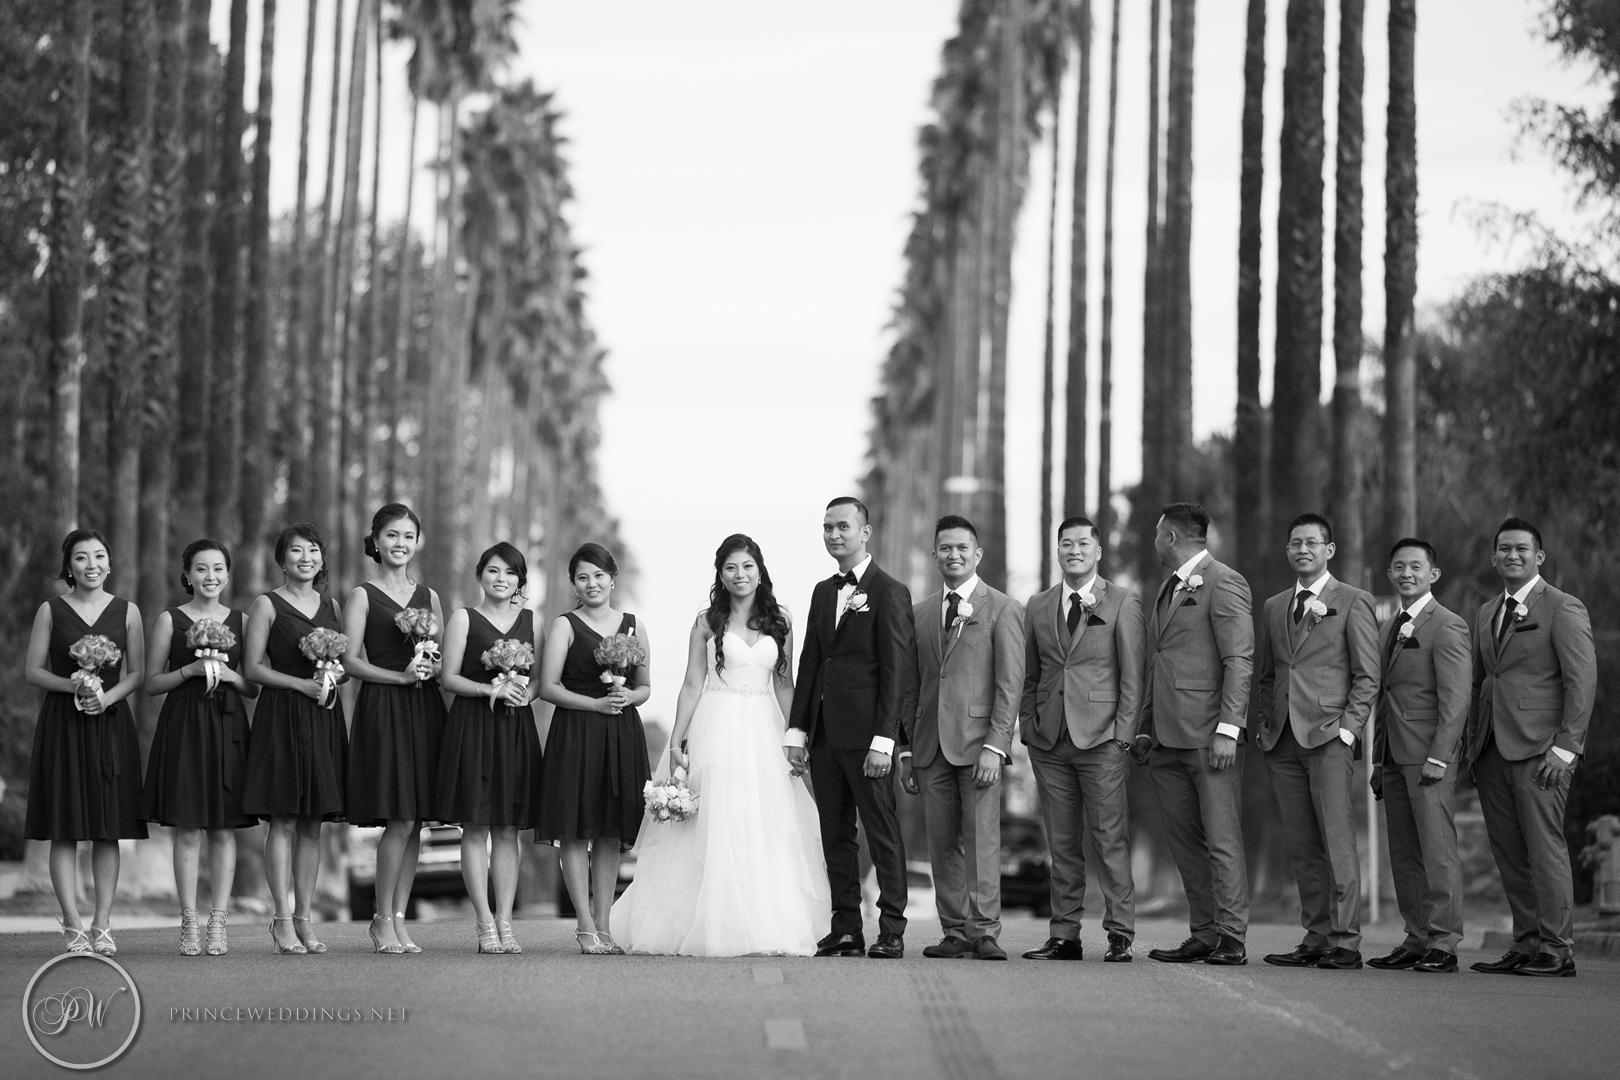 Castaway_Burbank_Wedding_Photo_Christian_Autumn051.jpg